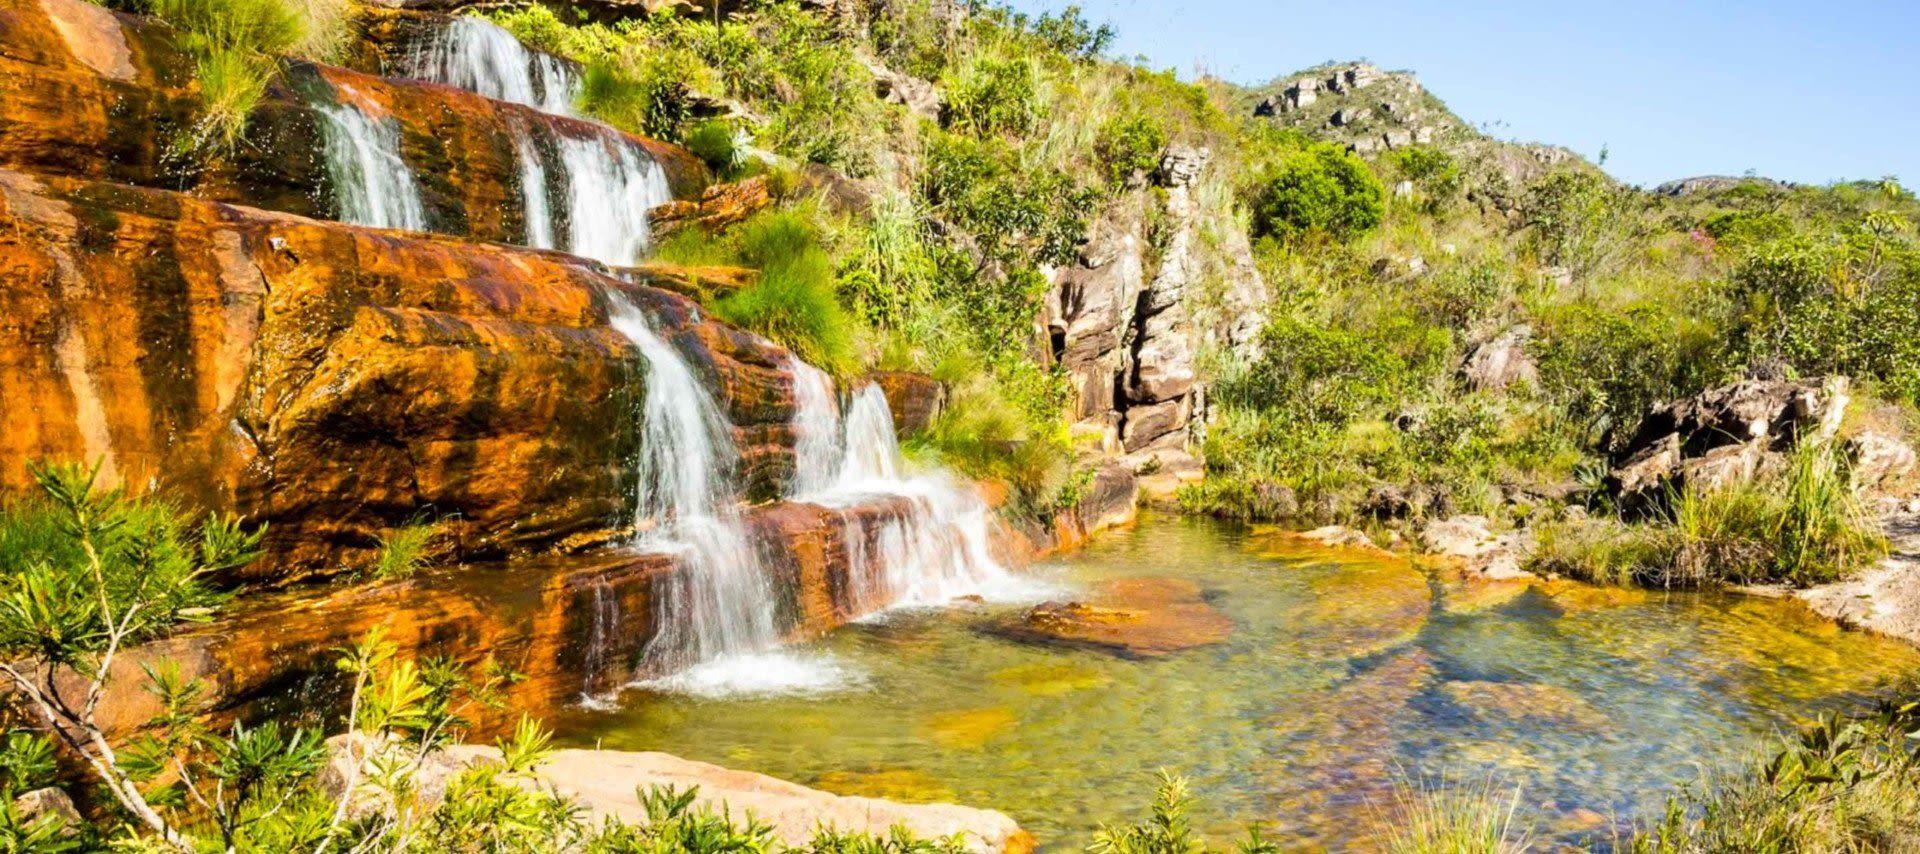 Chapada Diamantina waterfalls